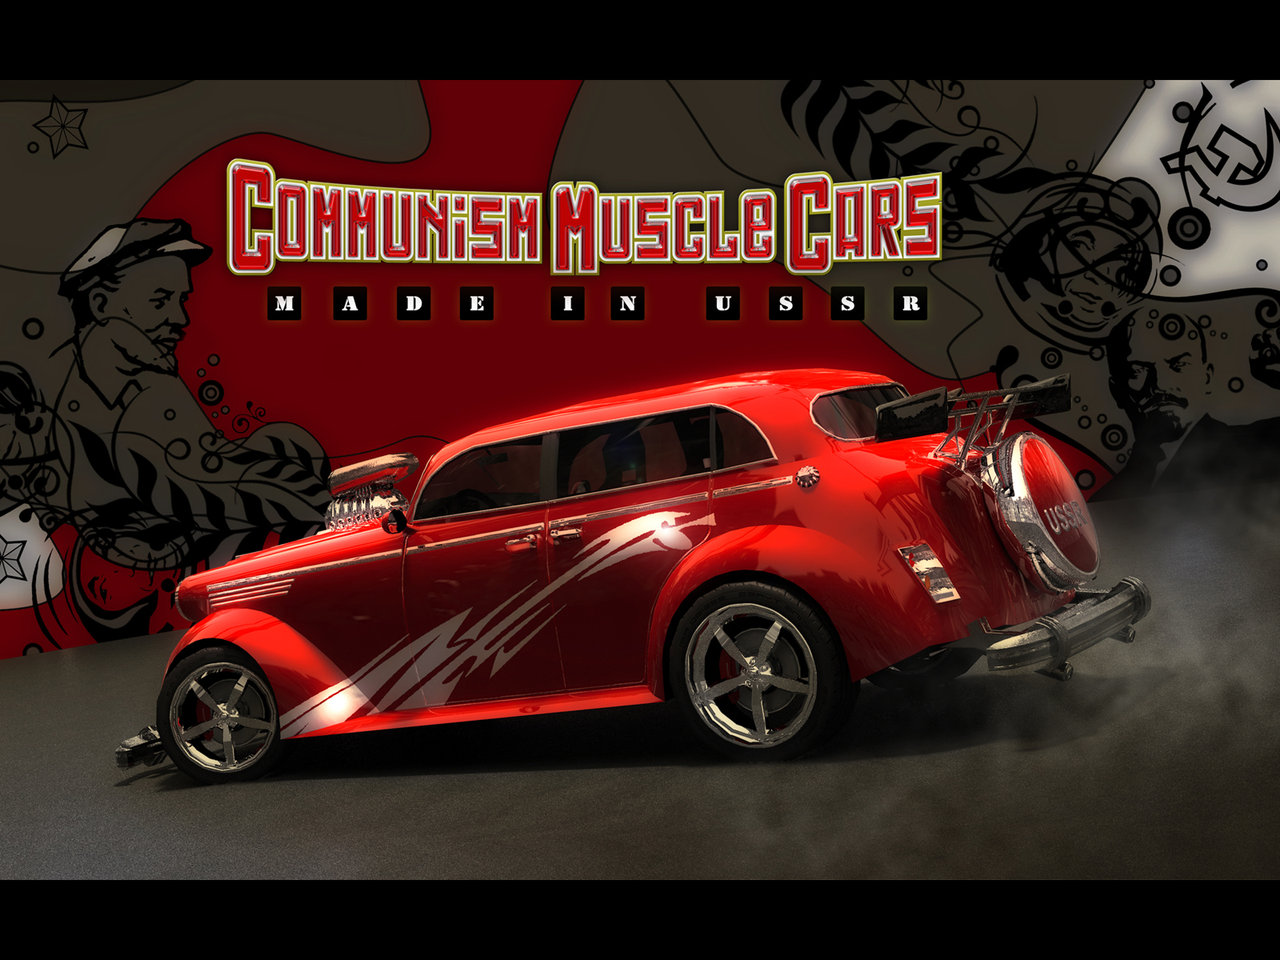 Communism Muscle Cars Desktop Wallpapers FREE on Latorocom 1280x960